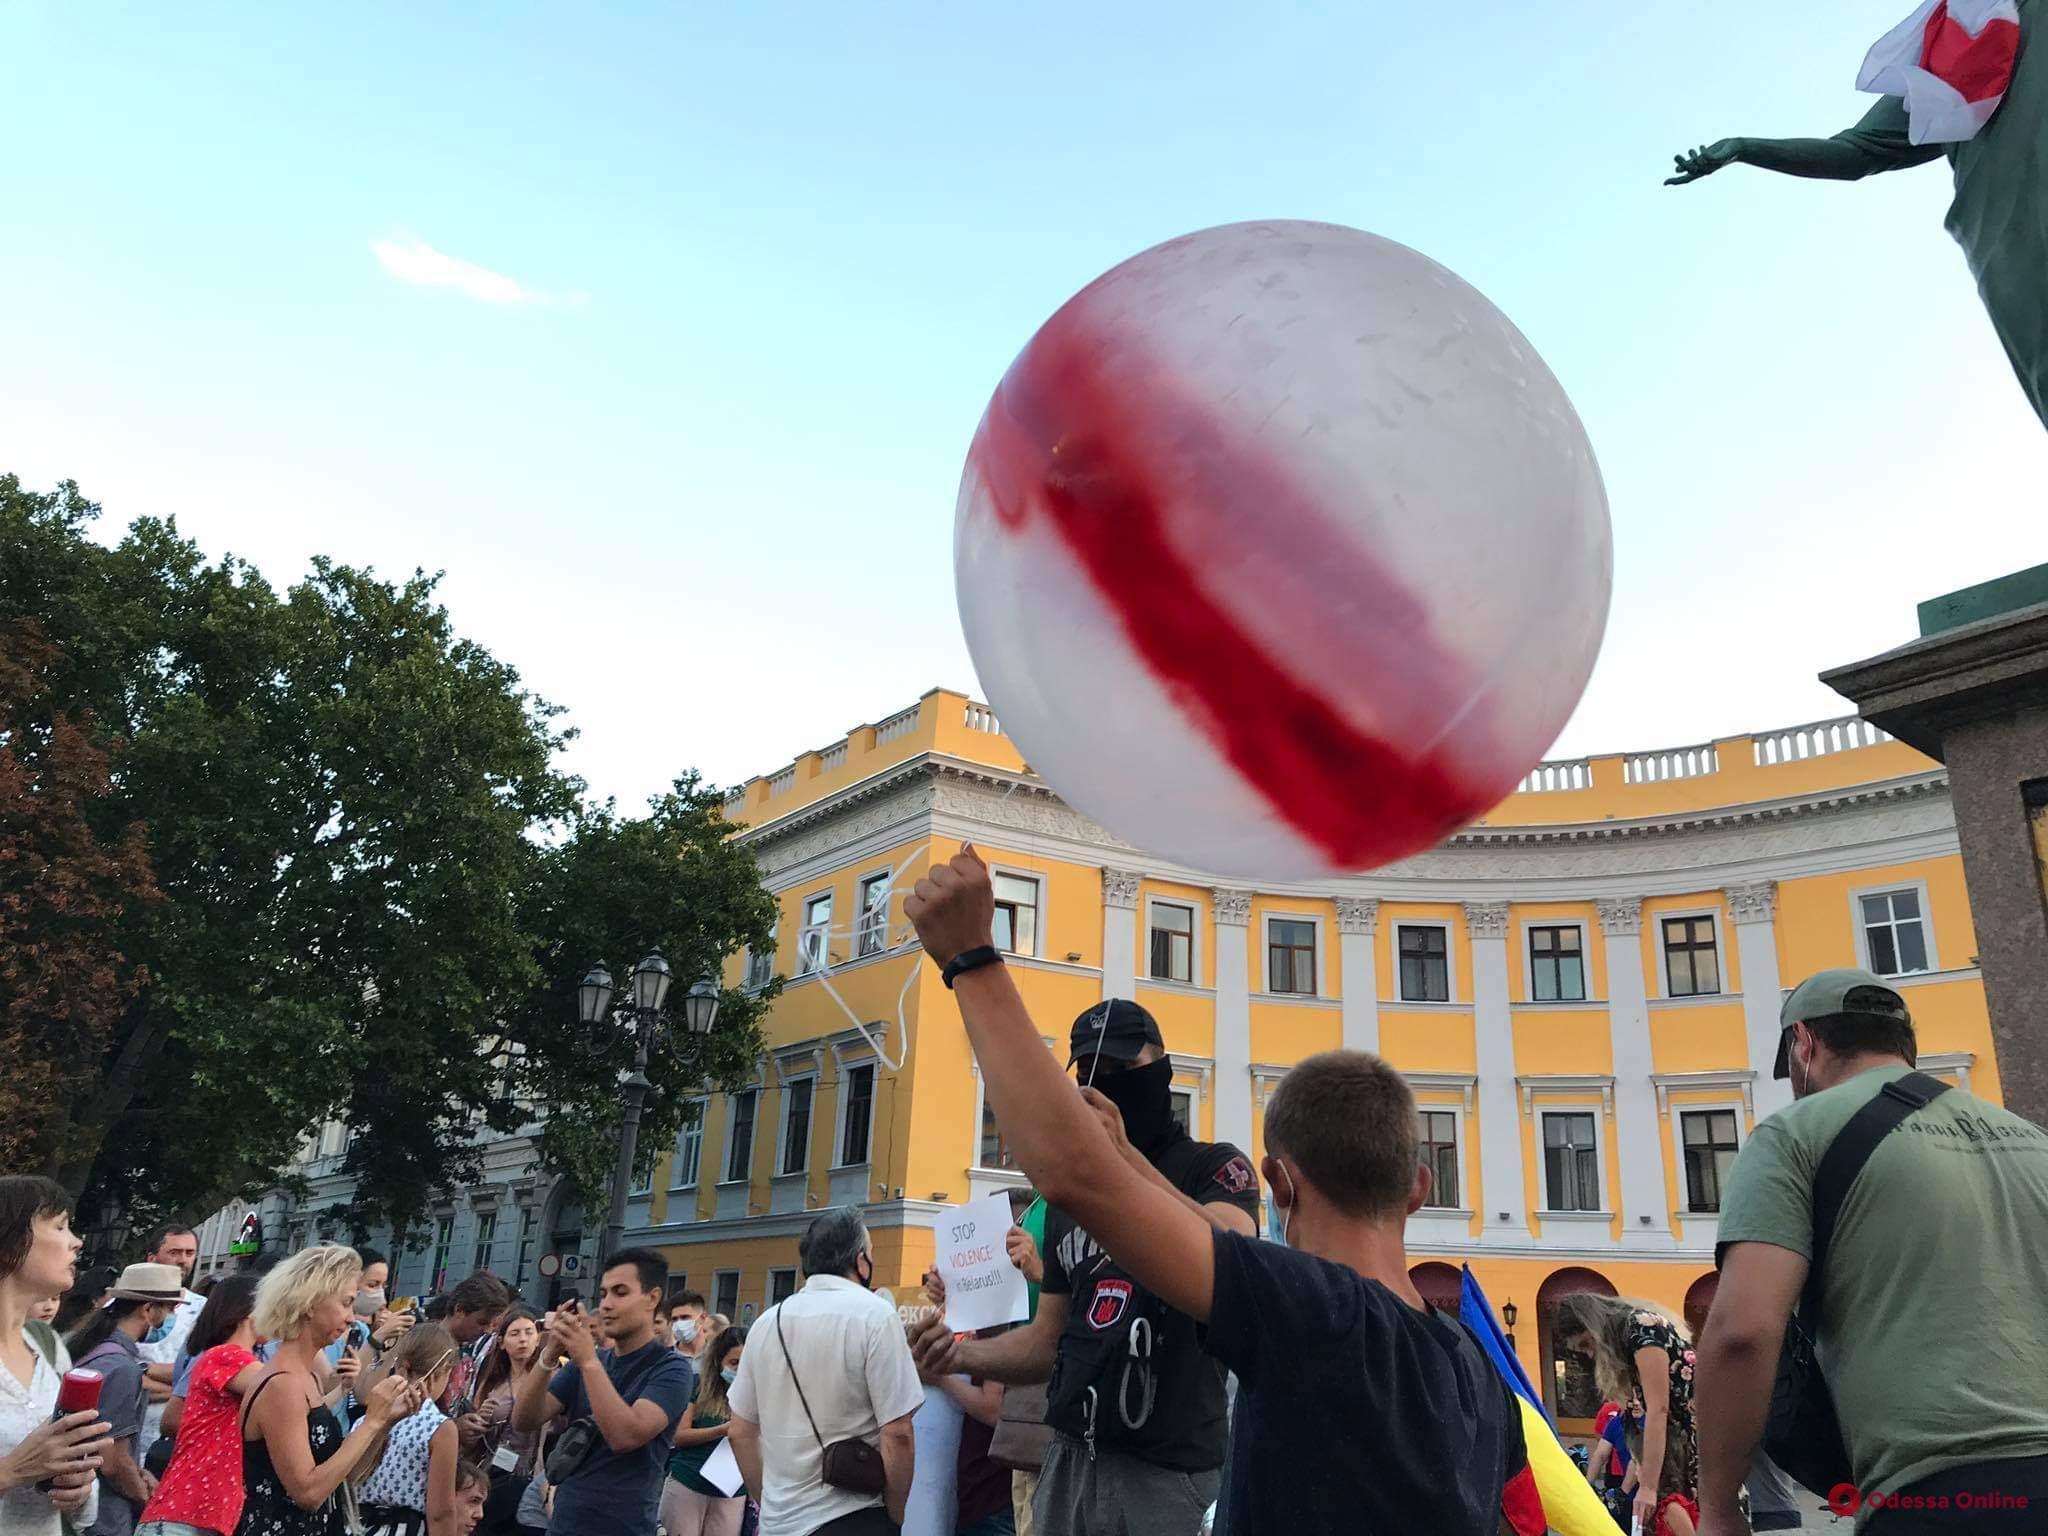 В Одессе прошла акция поддержки участников протестов в Беларуси (фото)